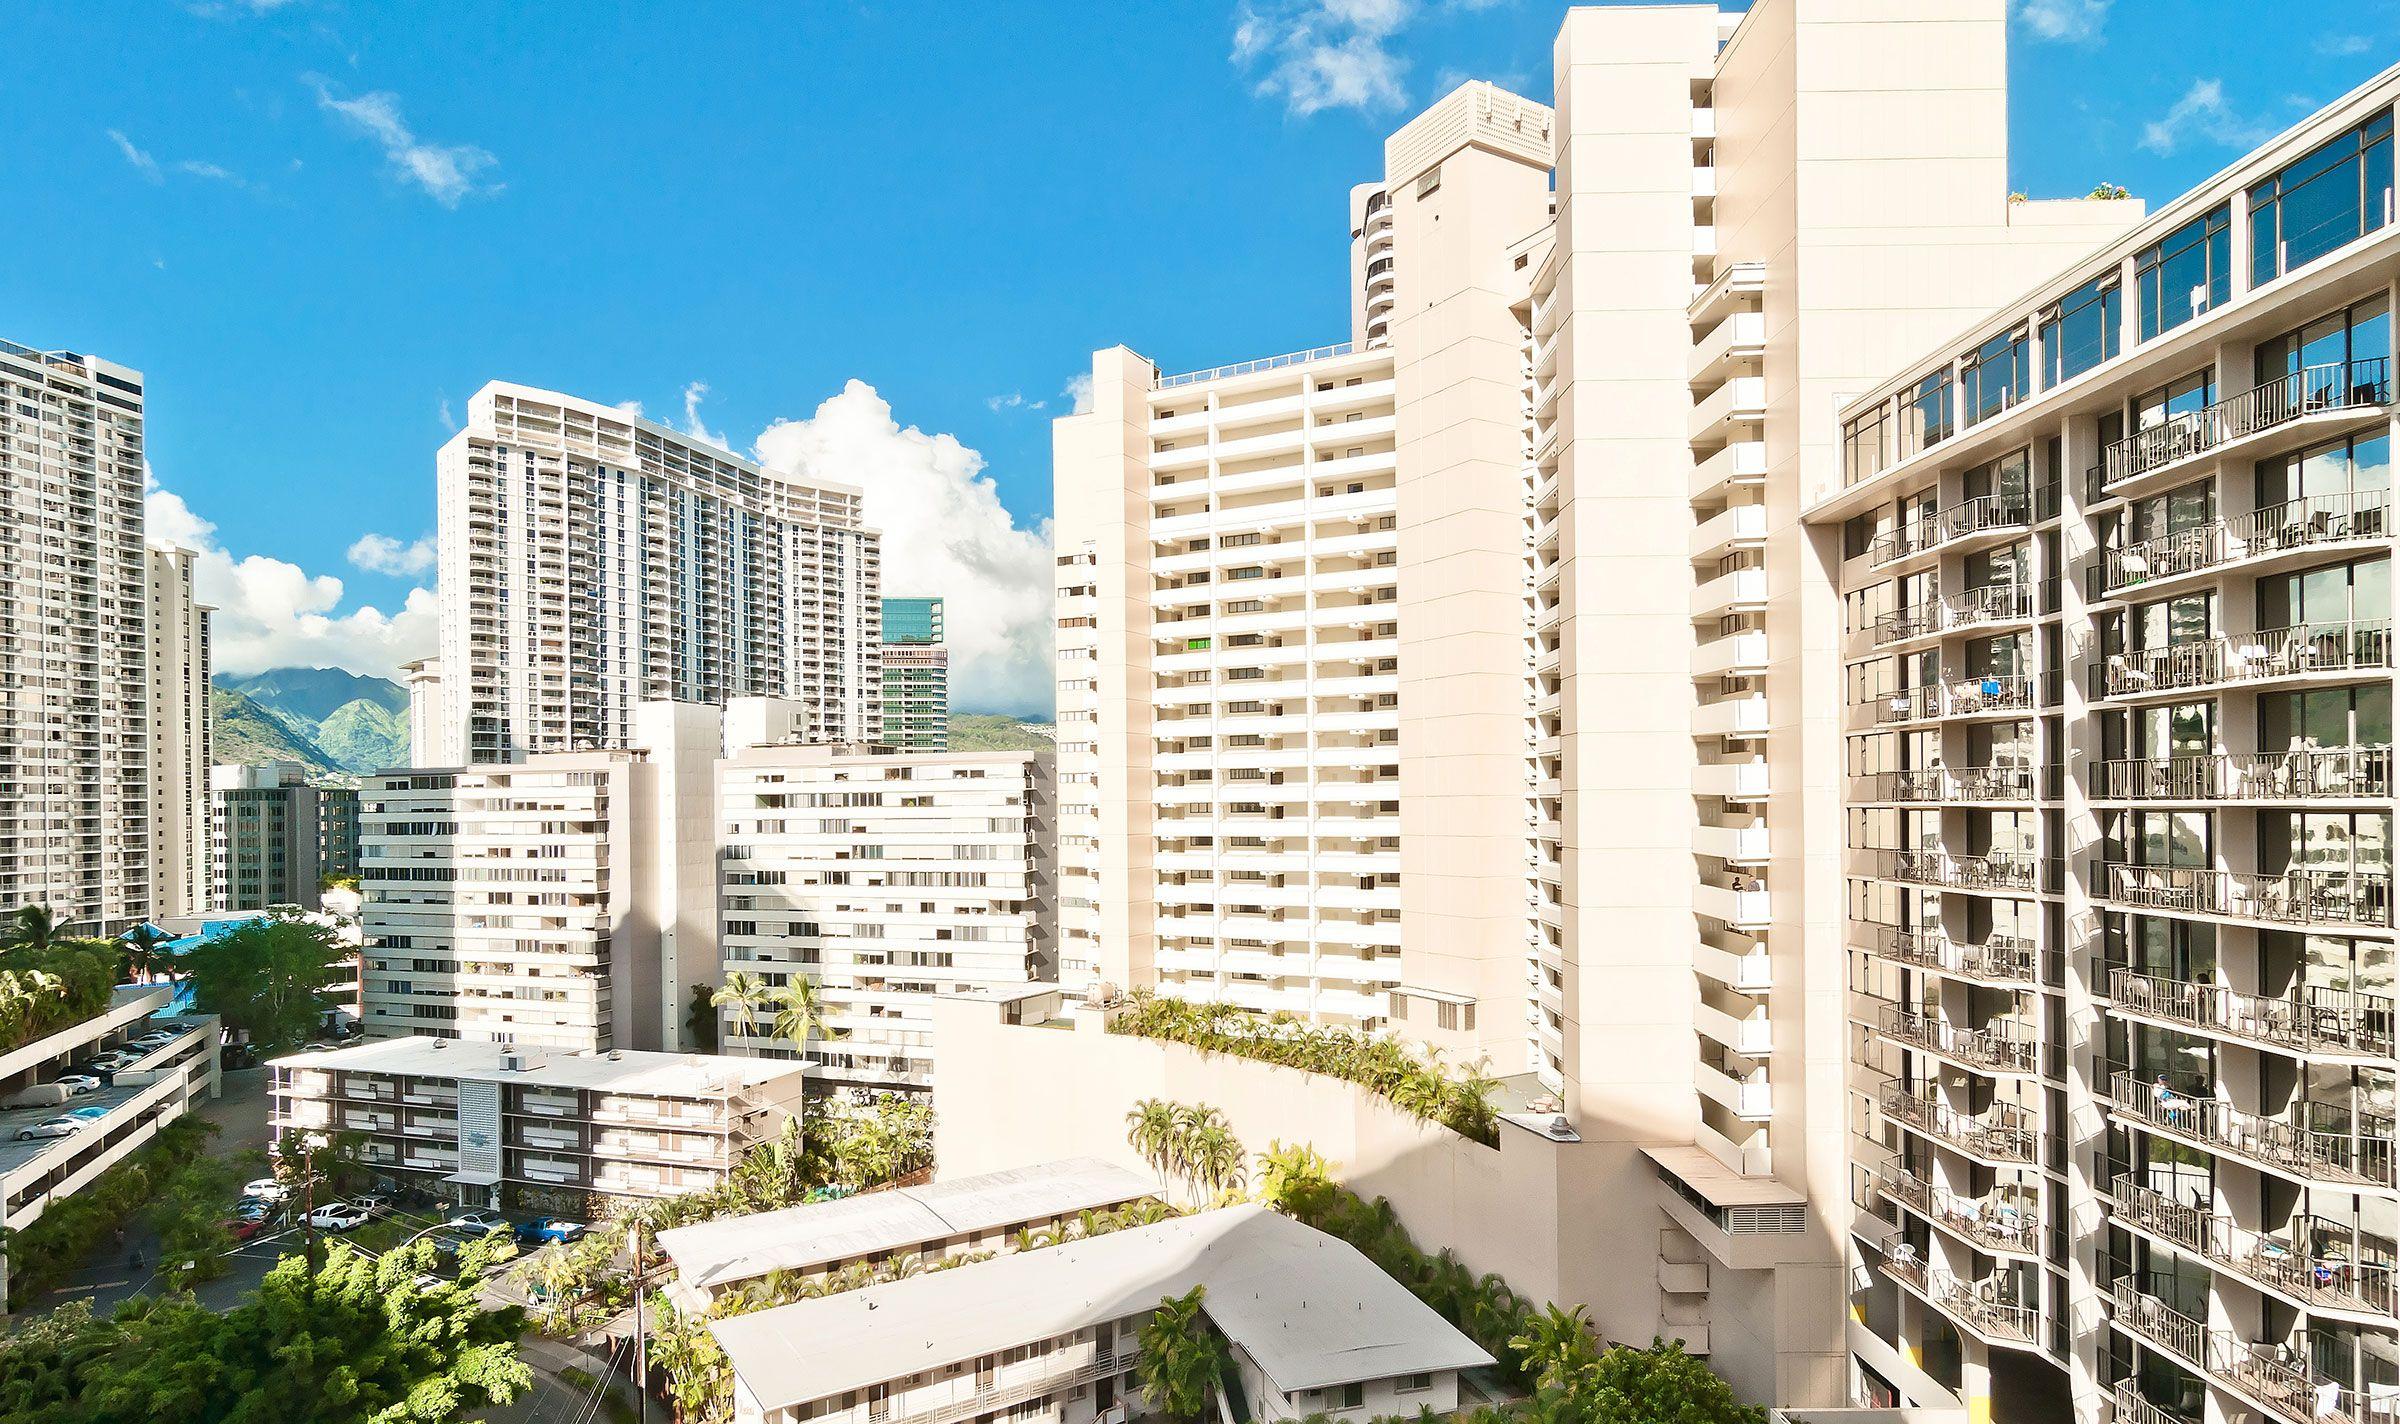 City of honolulu in hawaii hawaii real estate oahu